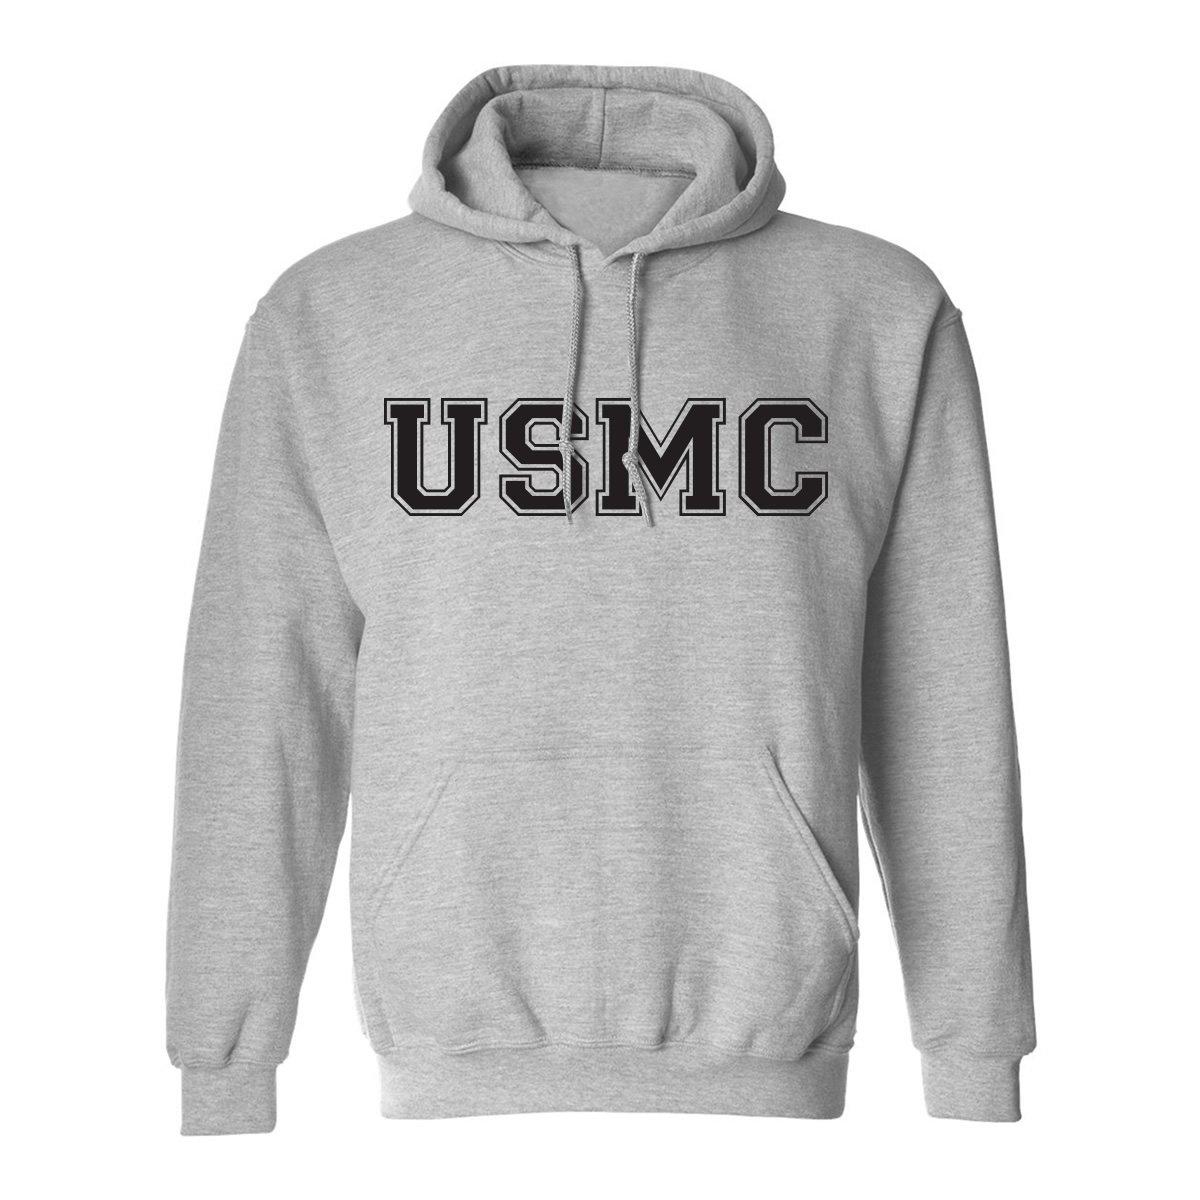 USMC Athletic Marines Hooded Sweatshirt in Gray PA-1036